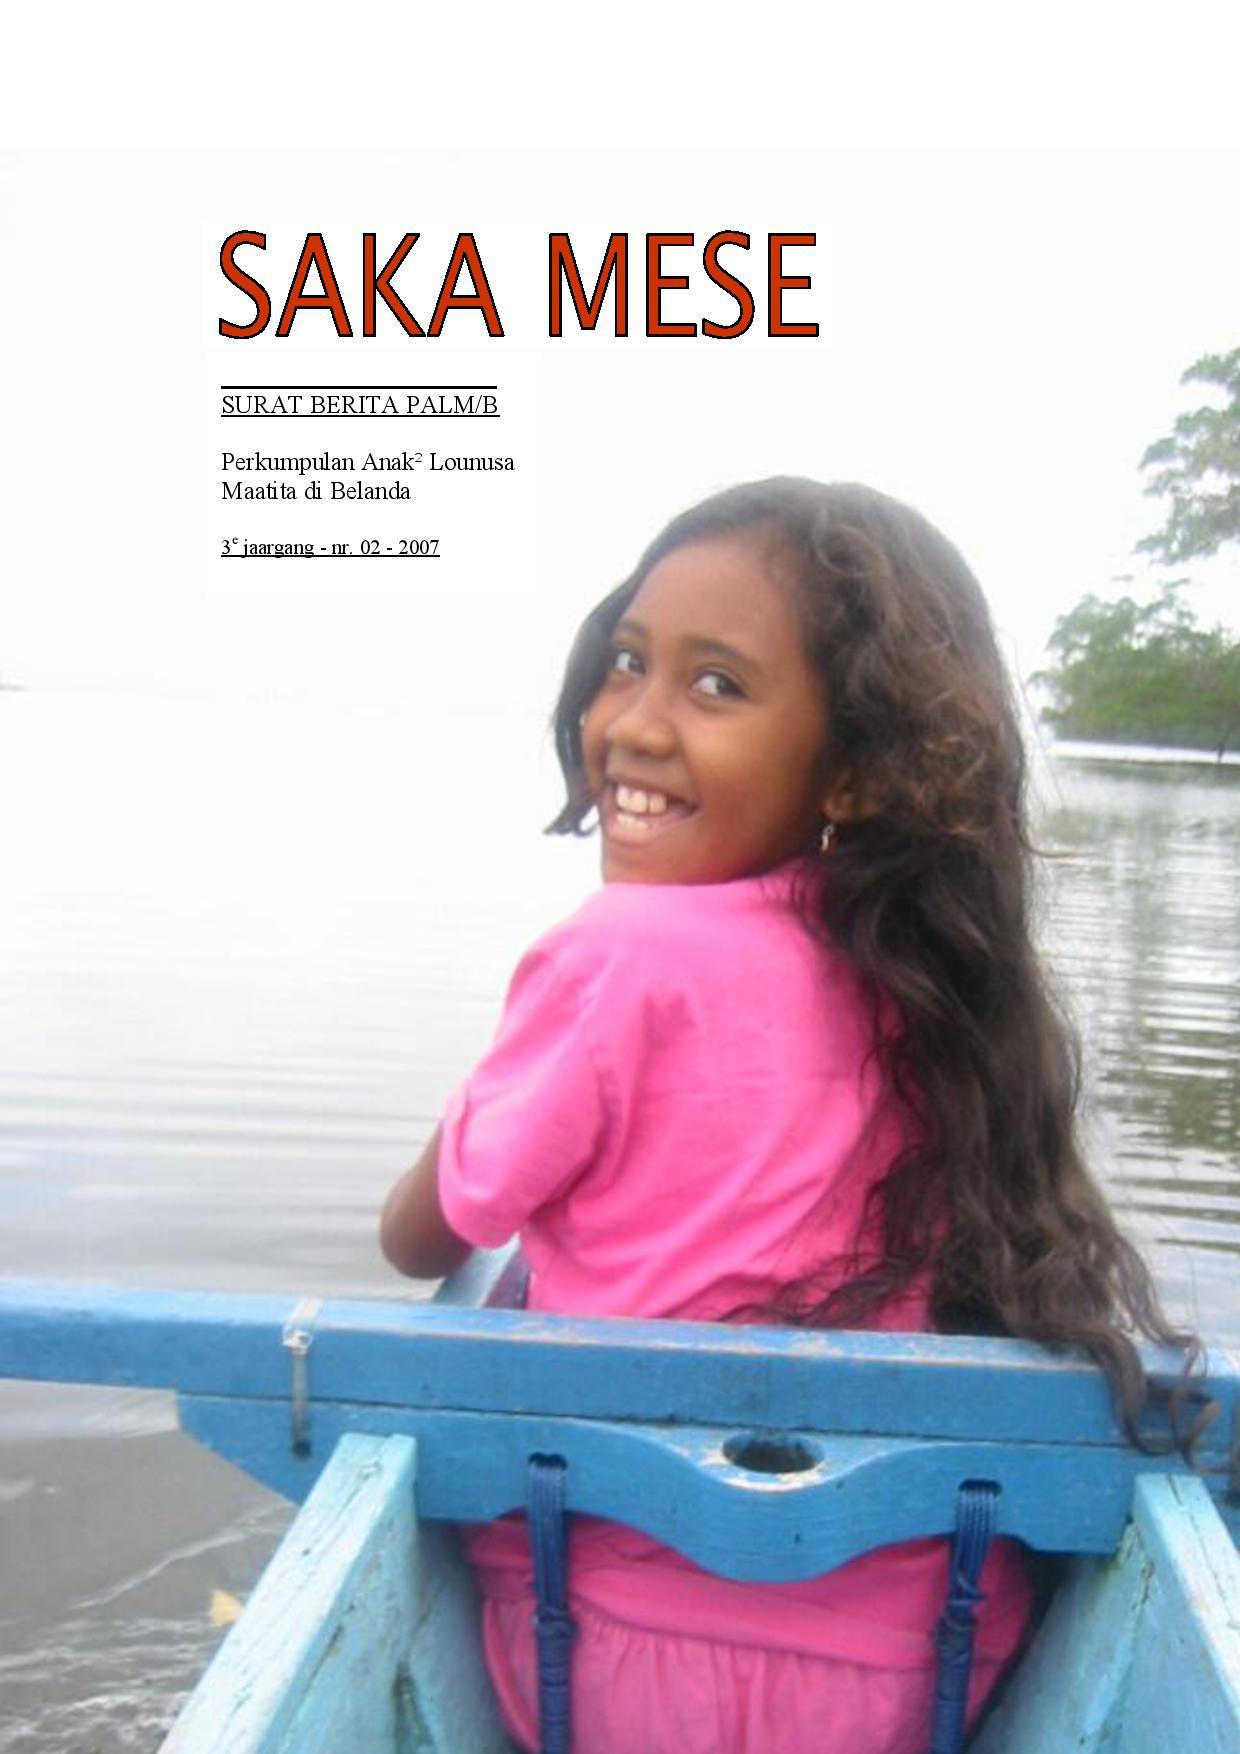 Saka Mese 3e jaargang nr. 02-2007 definitieve webversie-page-001